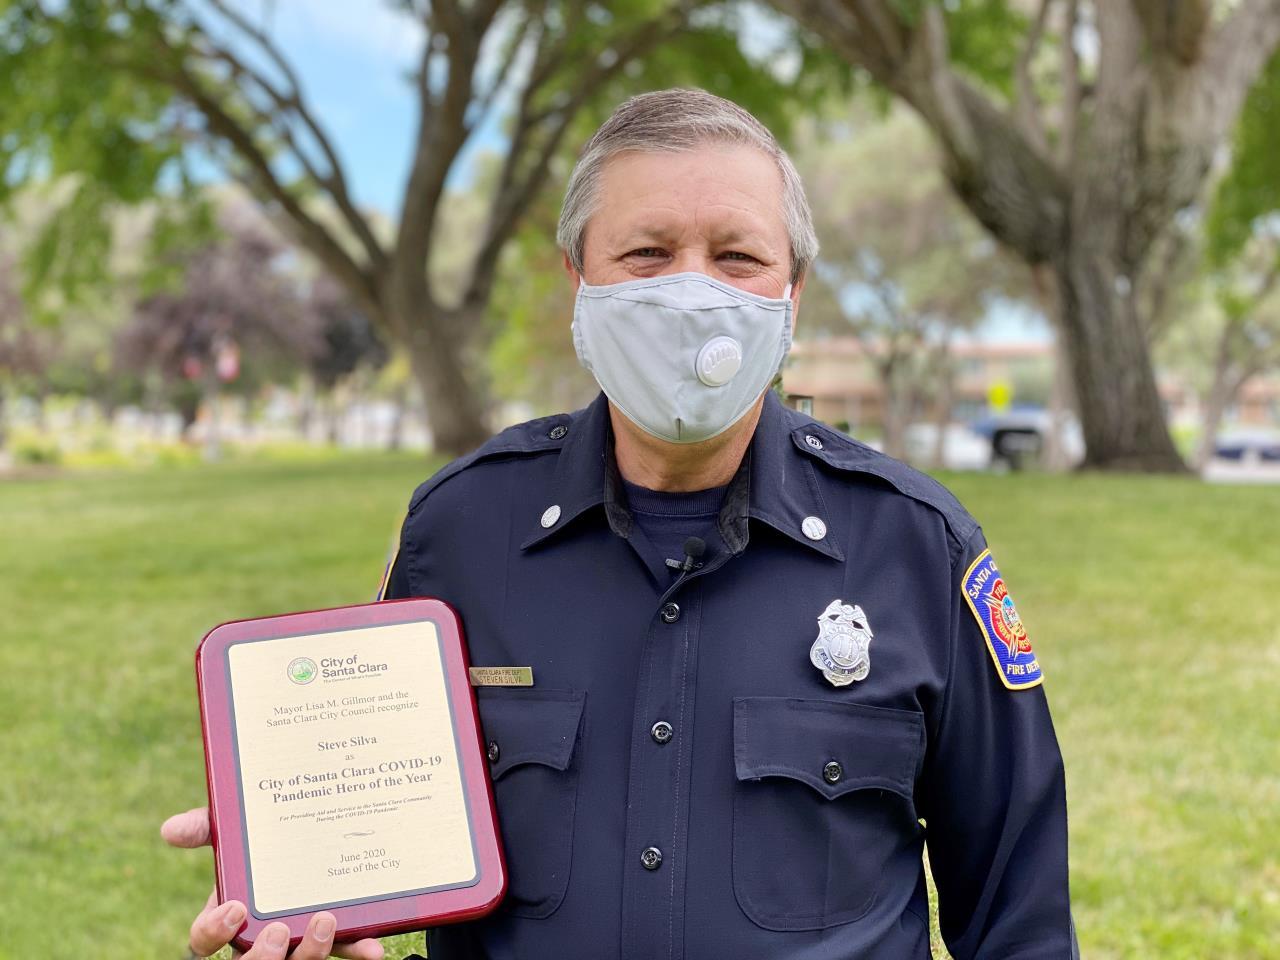 Steve Silva COVID19 Pandemic Hero of the Year